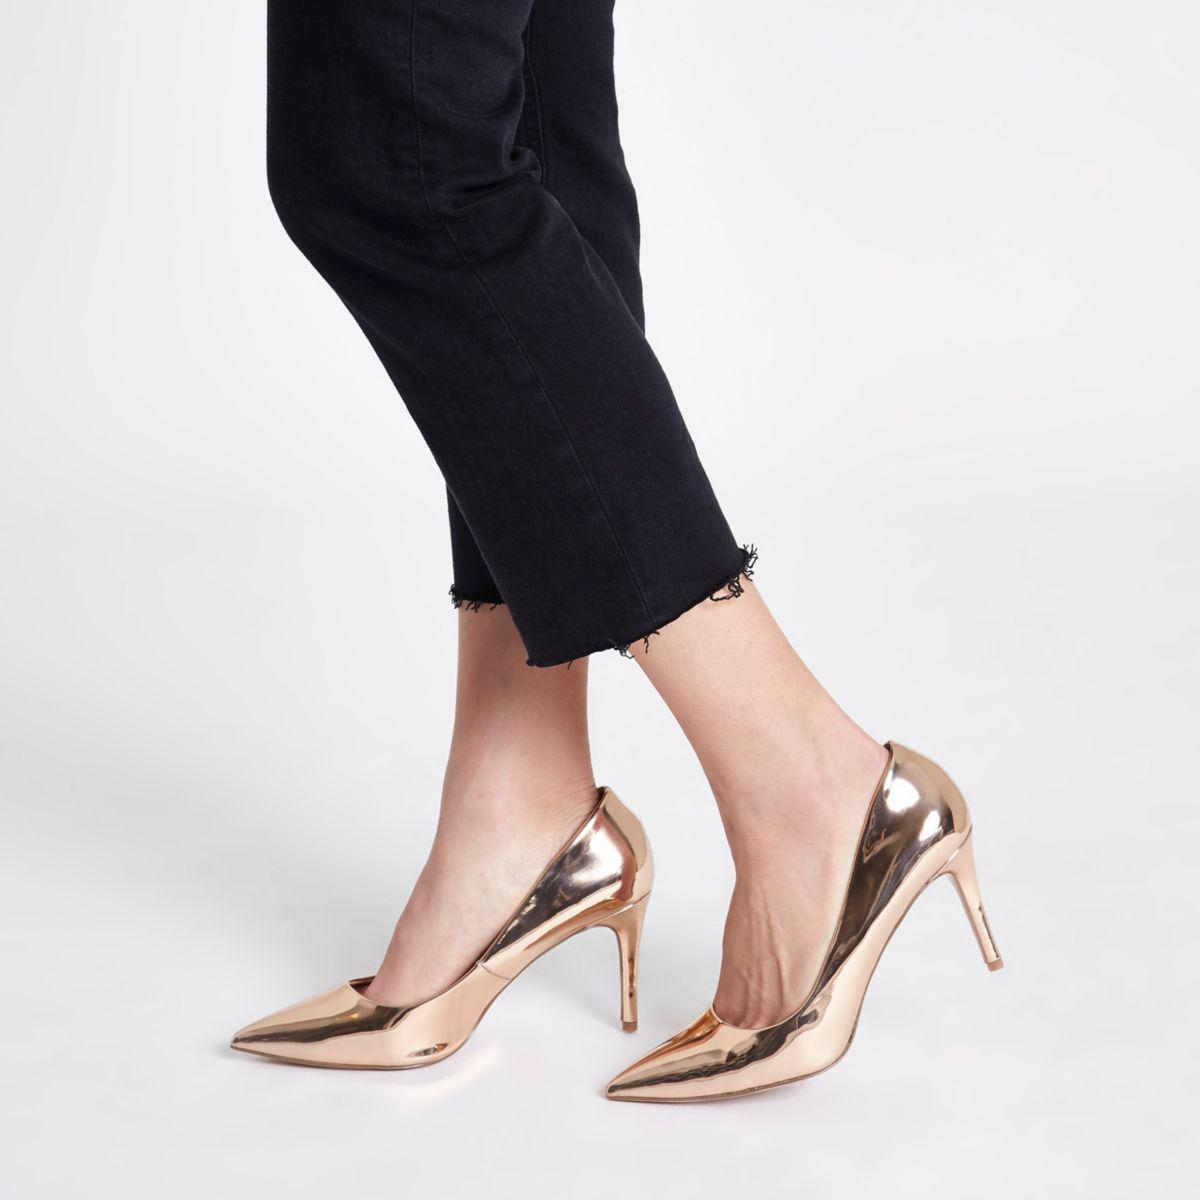 5b310f8899920 Lyst - River Island Rose Gold Metallic Mid Heel Court Shoes Rose ...